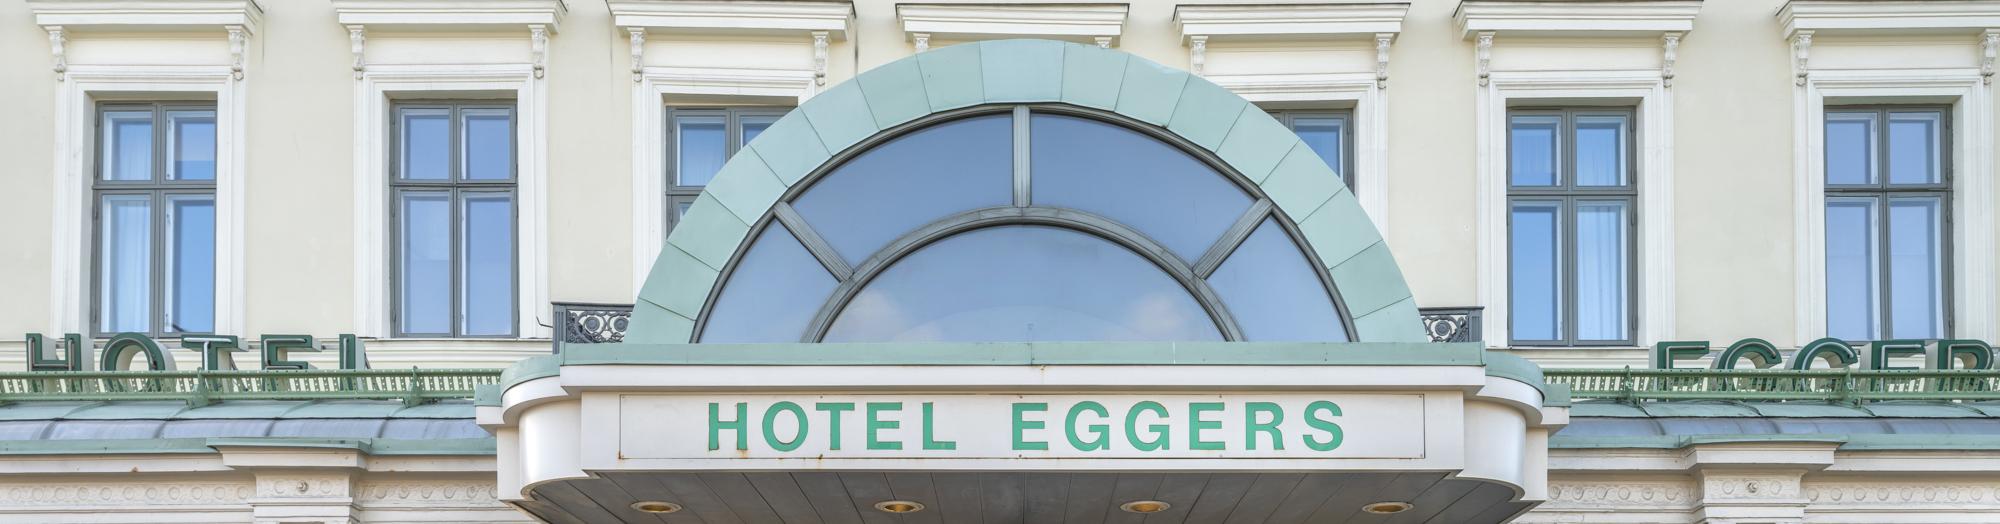 hotel-eggers